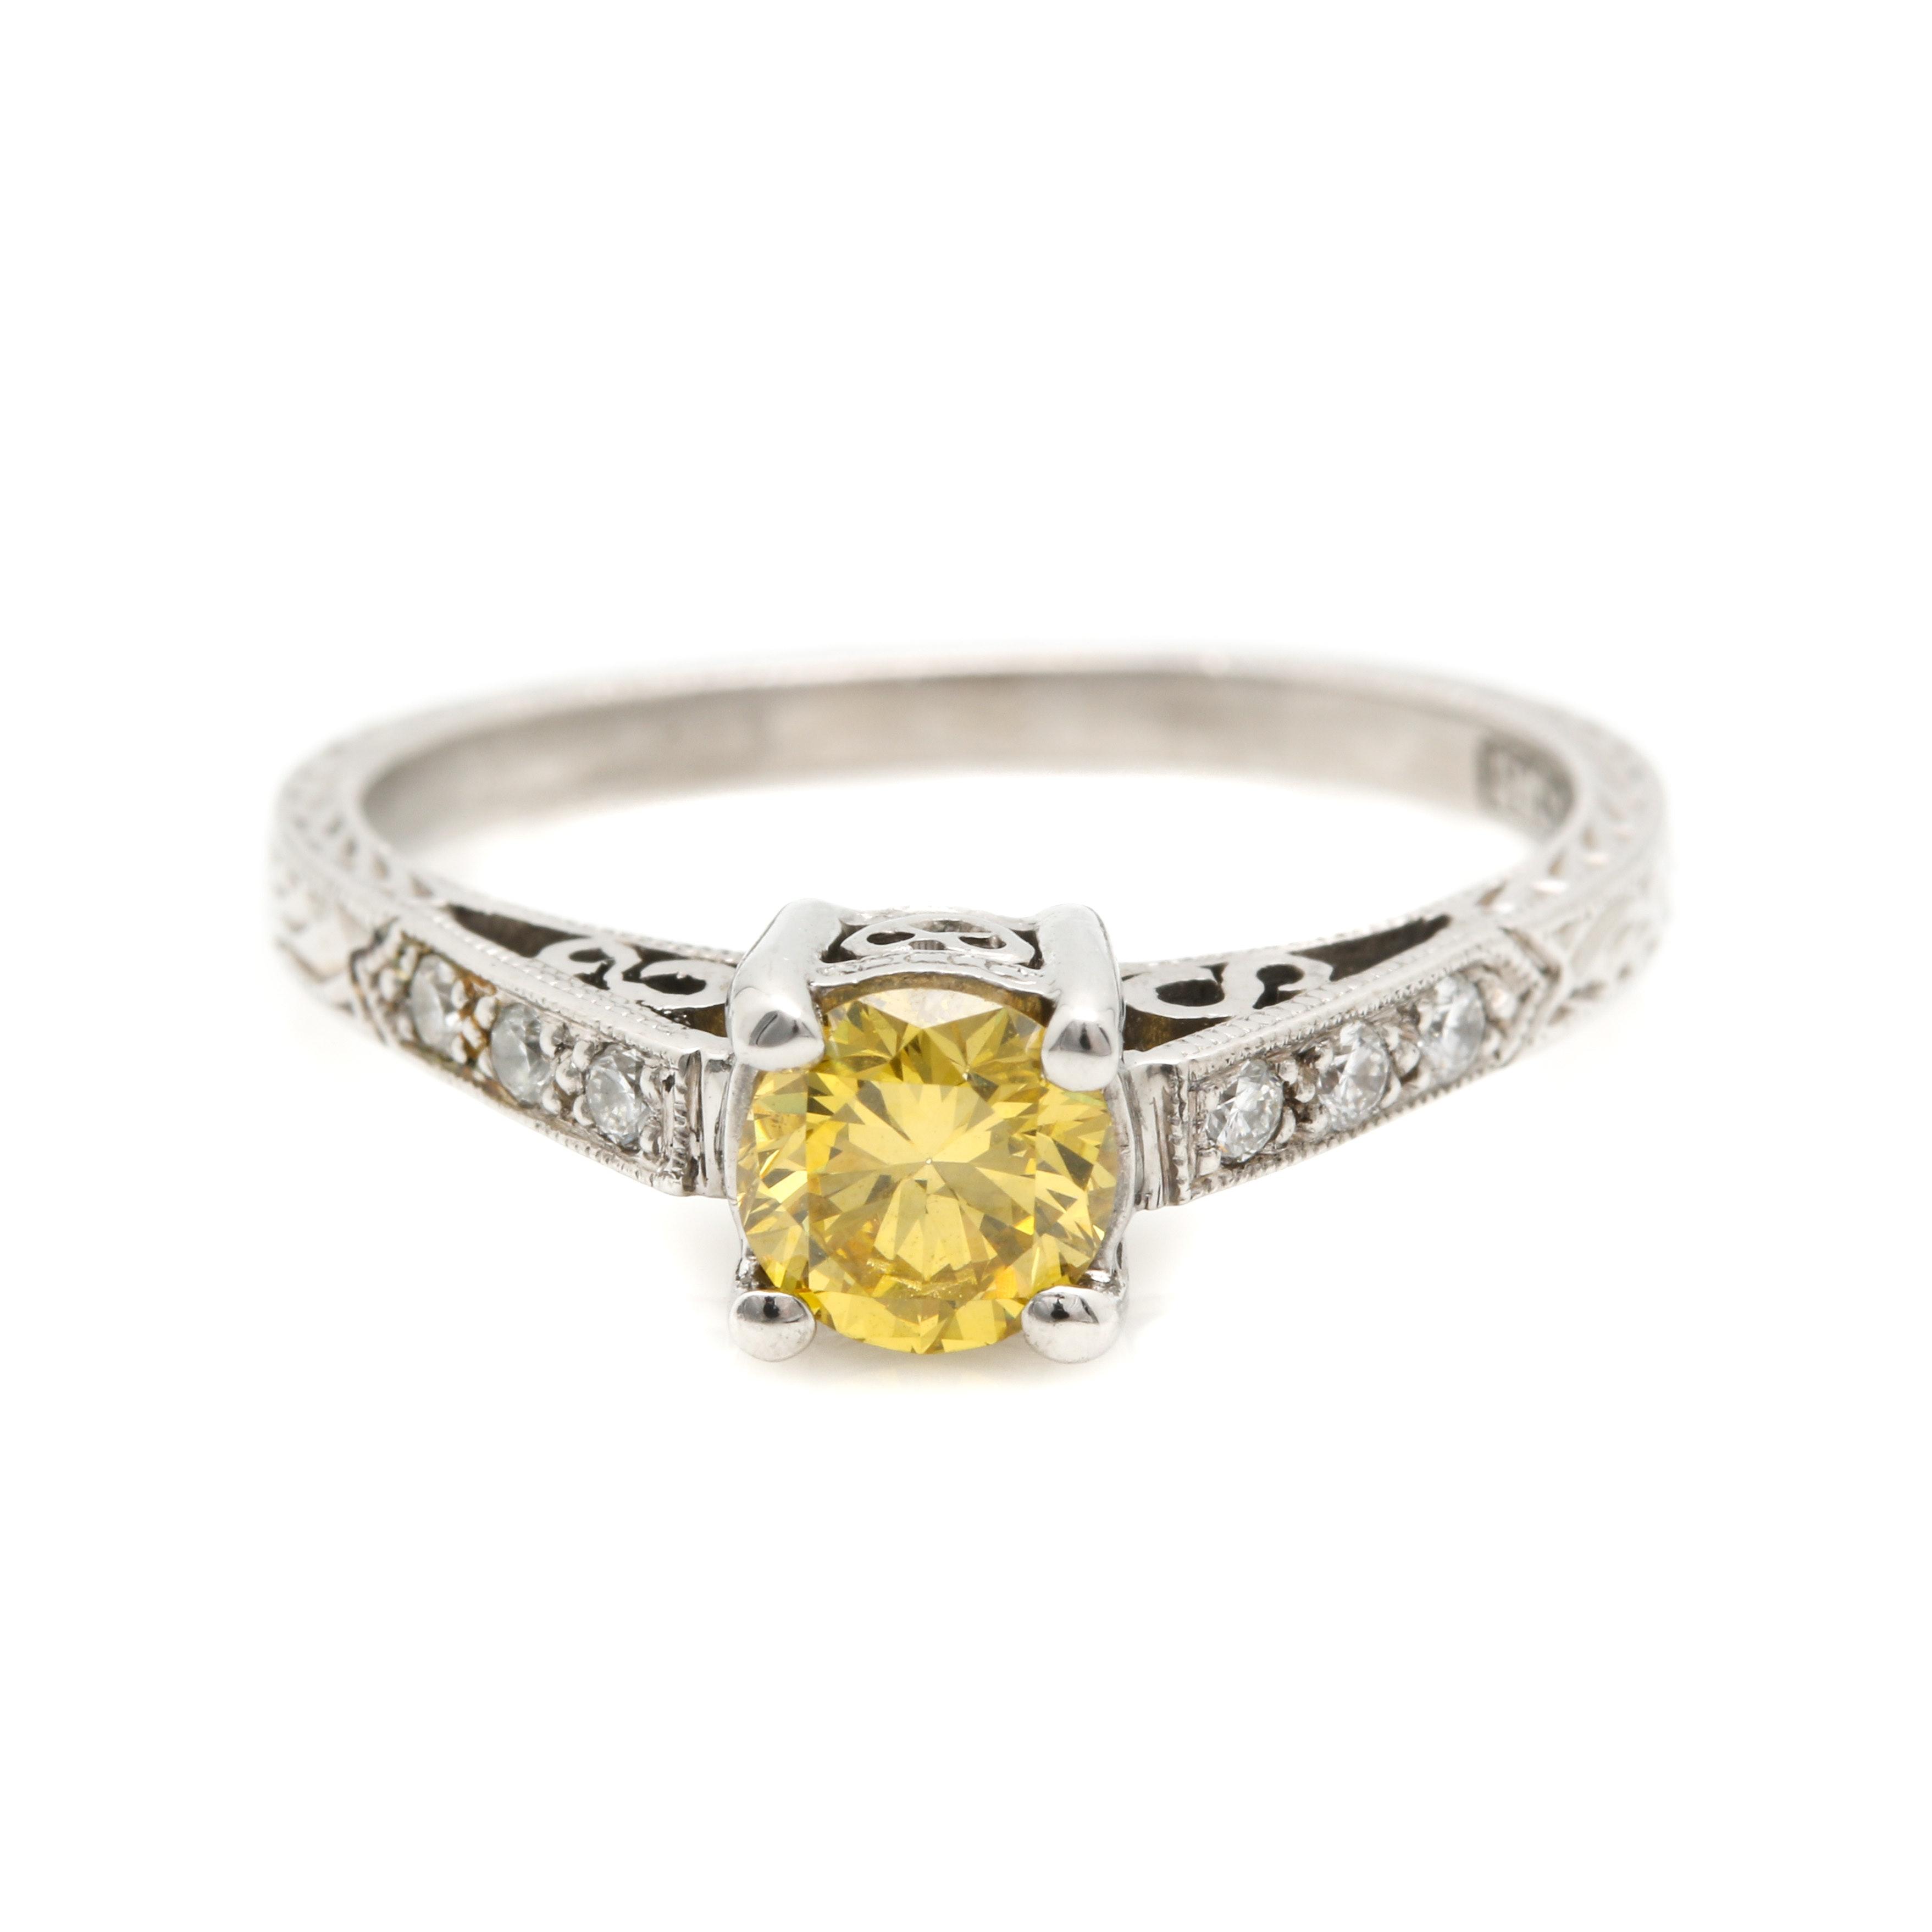 Tacori 18K White Gold 0.51 CT Yellow Diamond Ring